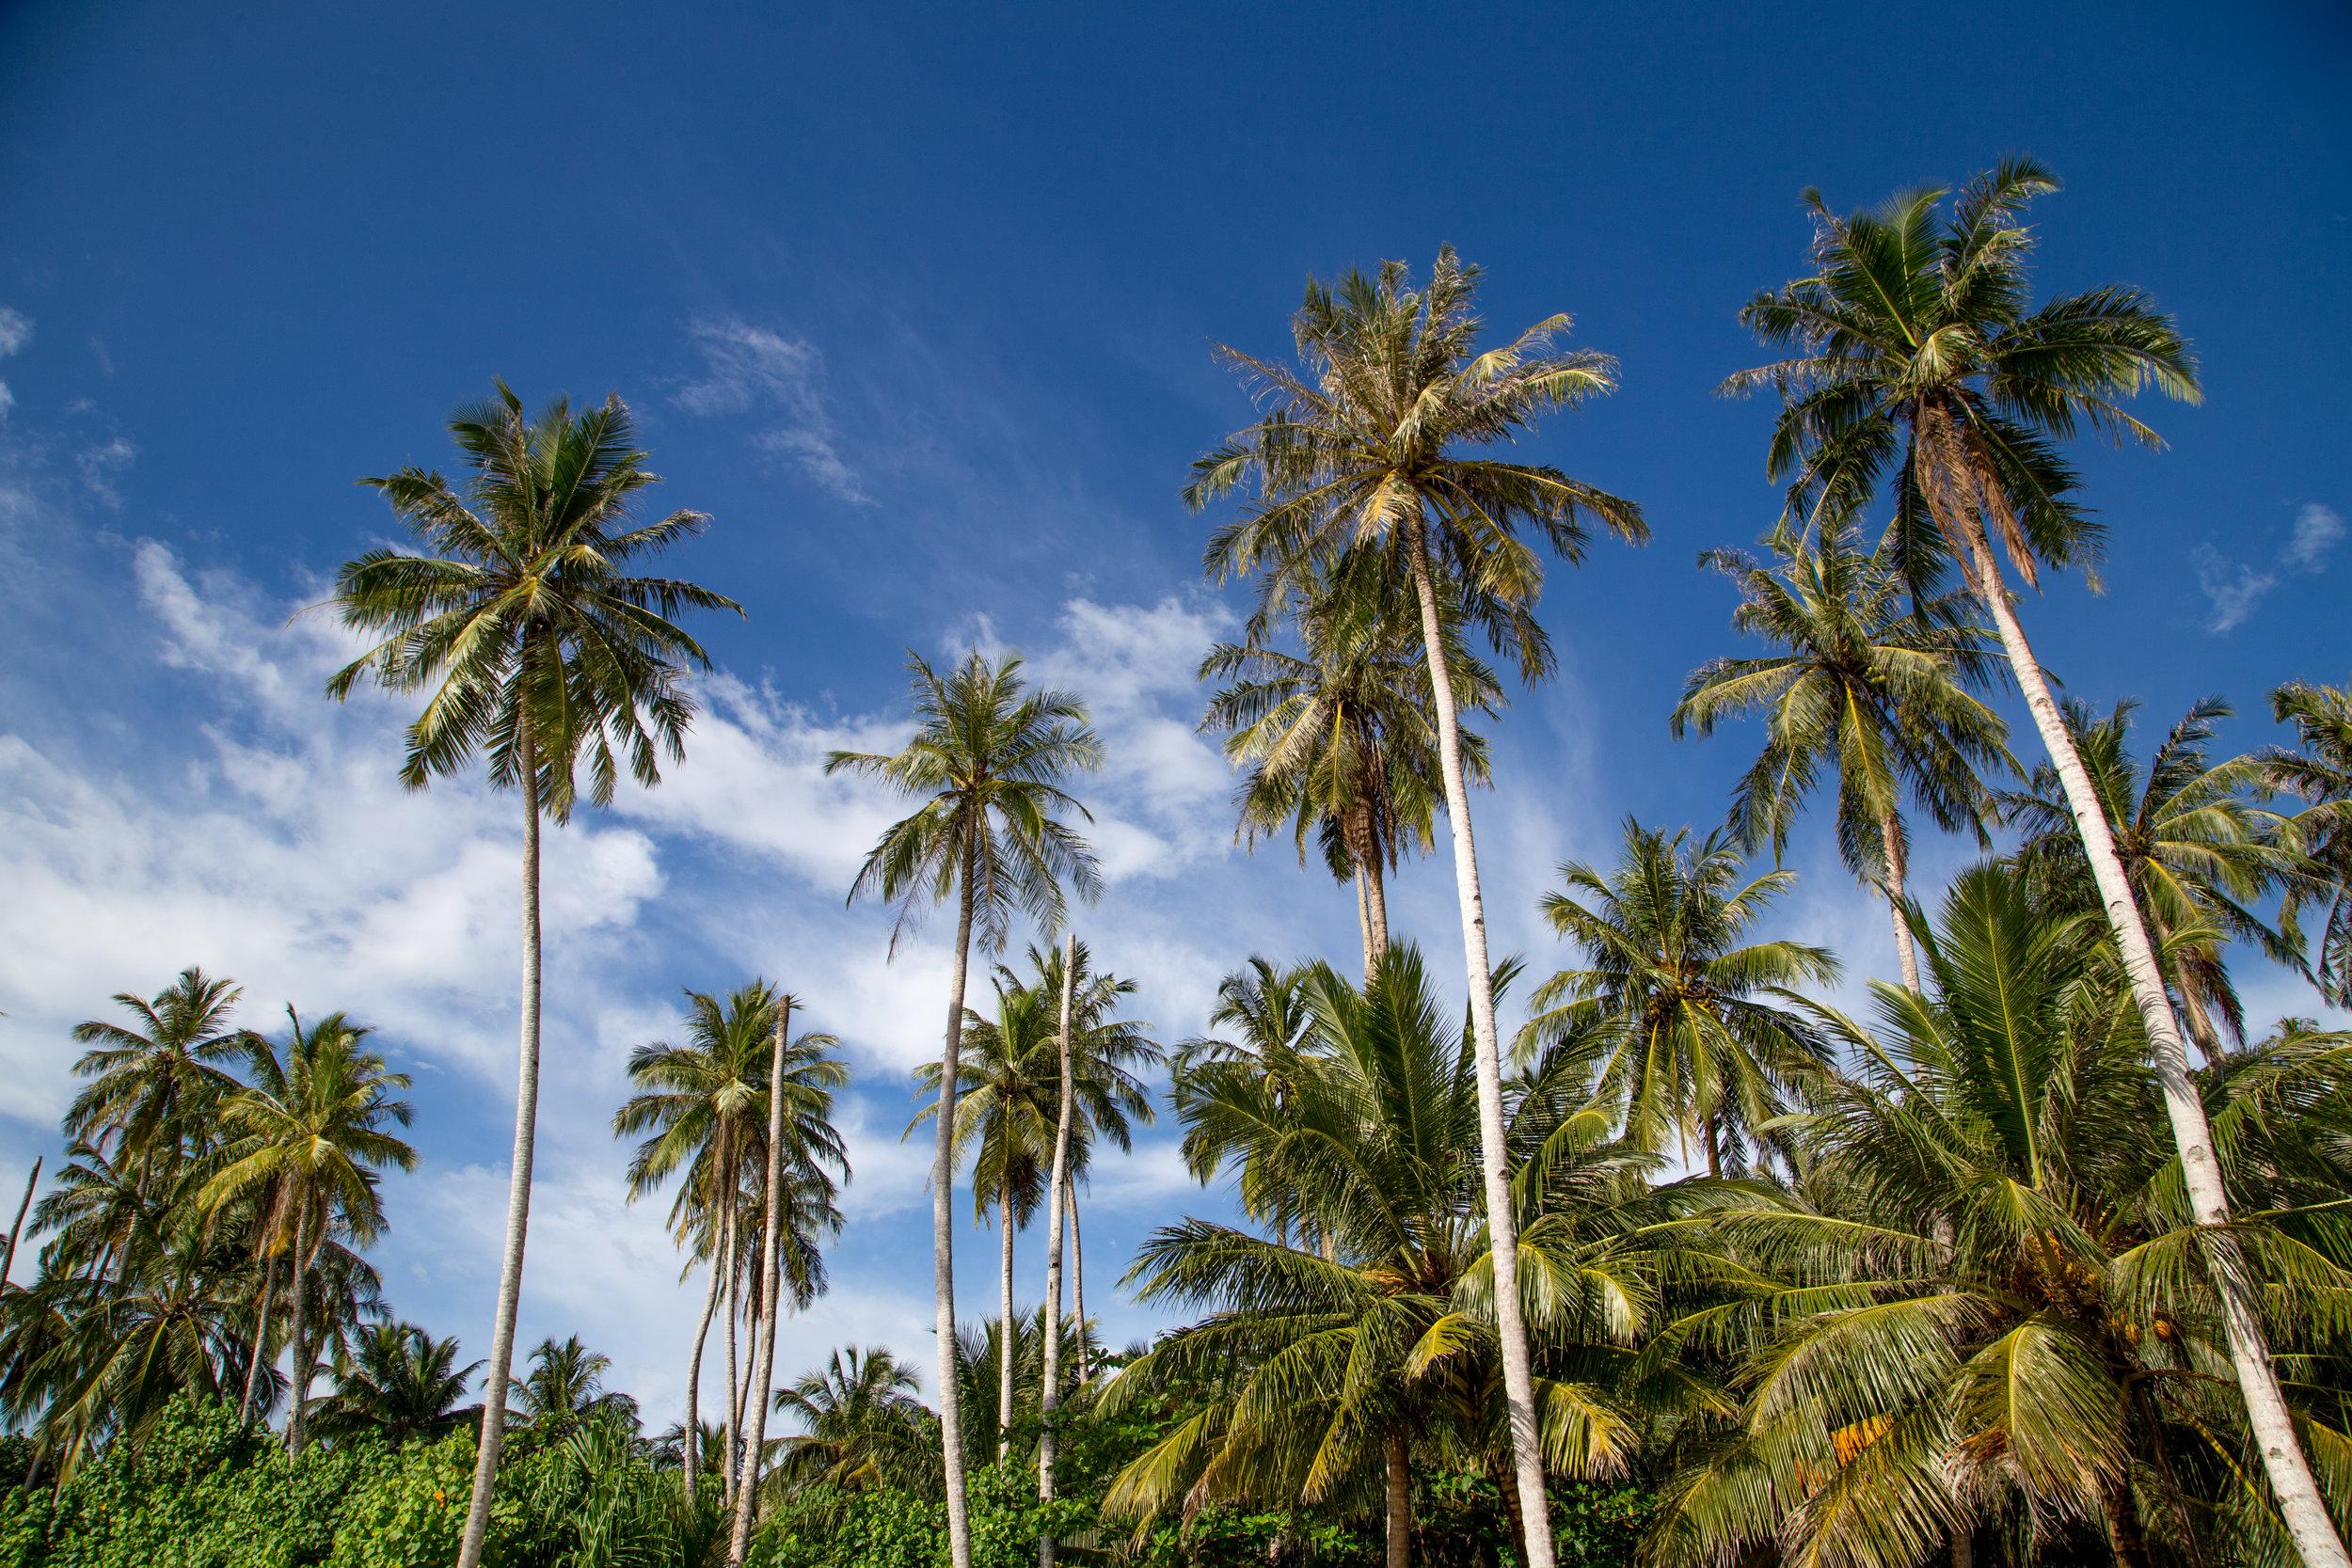 The Mentawais by Far Features